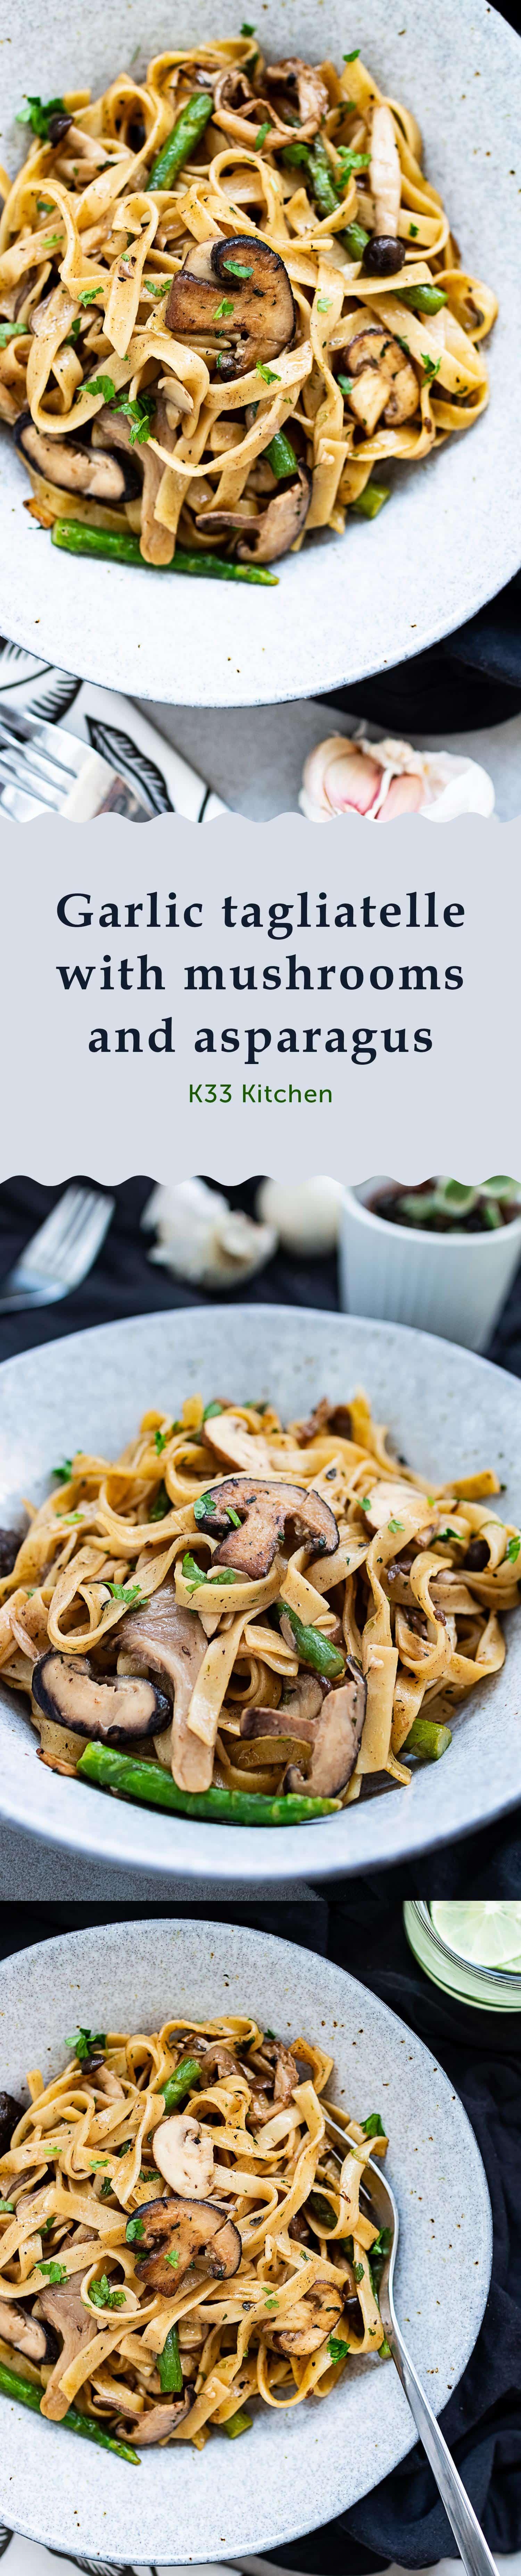 Garlic tagliatelle with mushrooms and asparagus